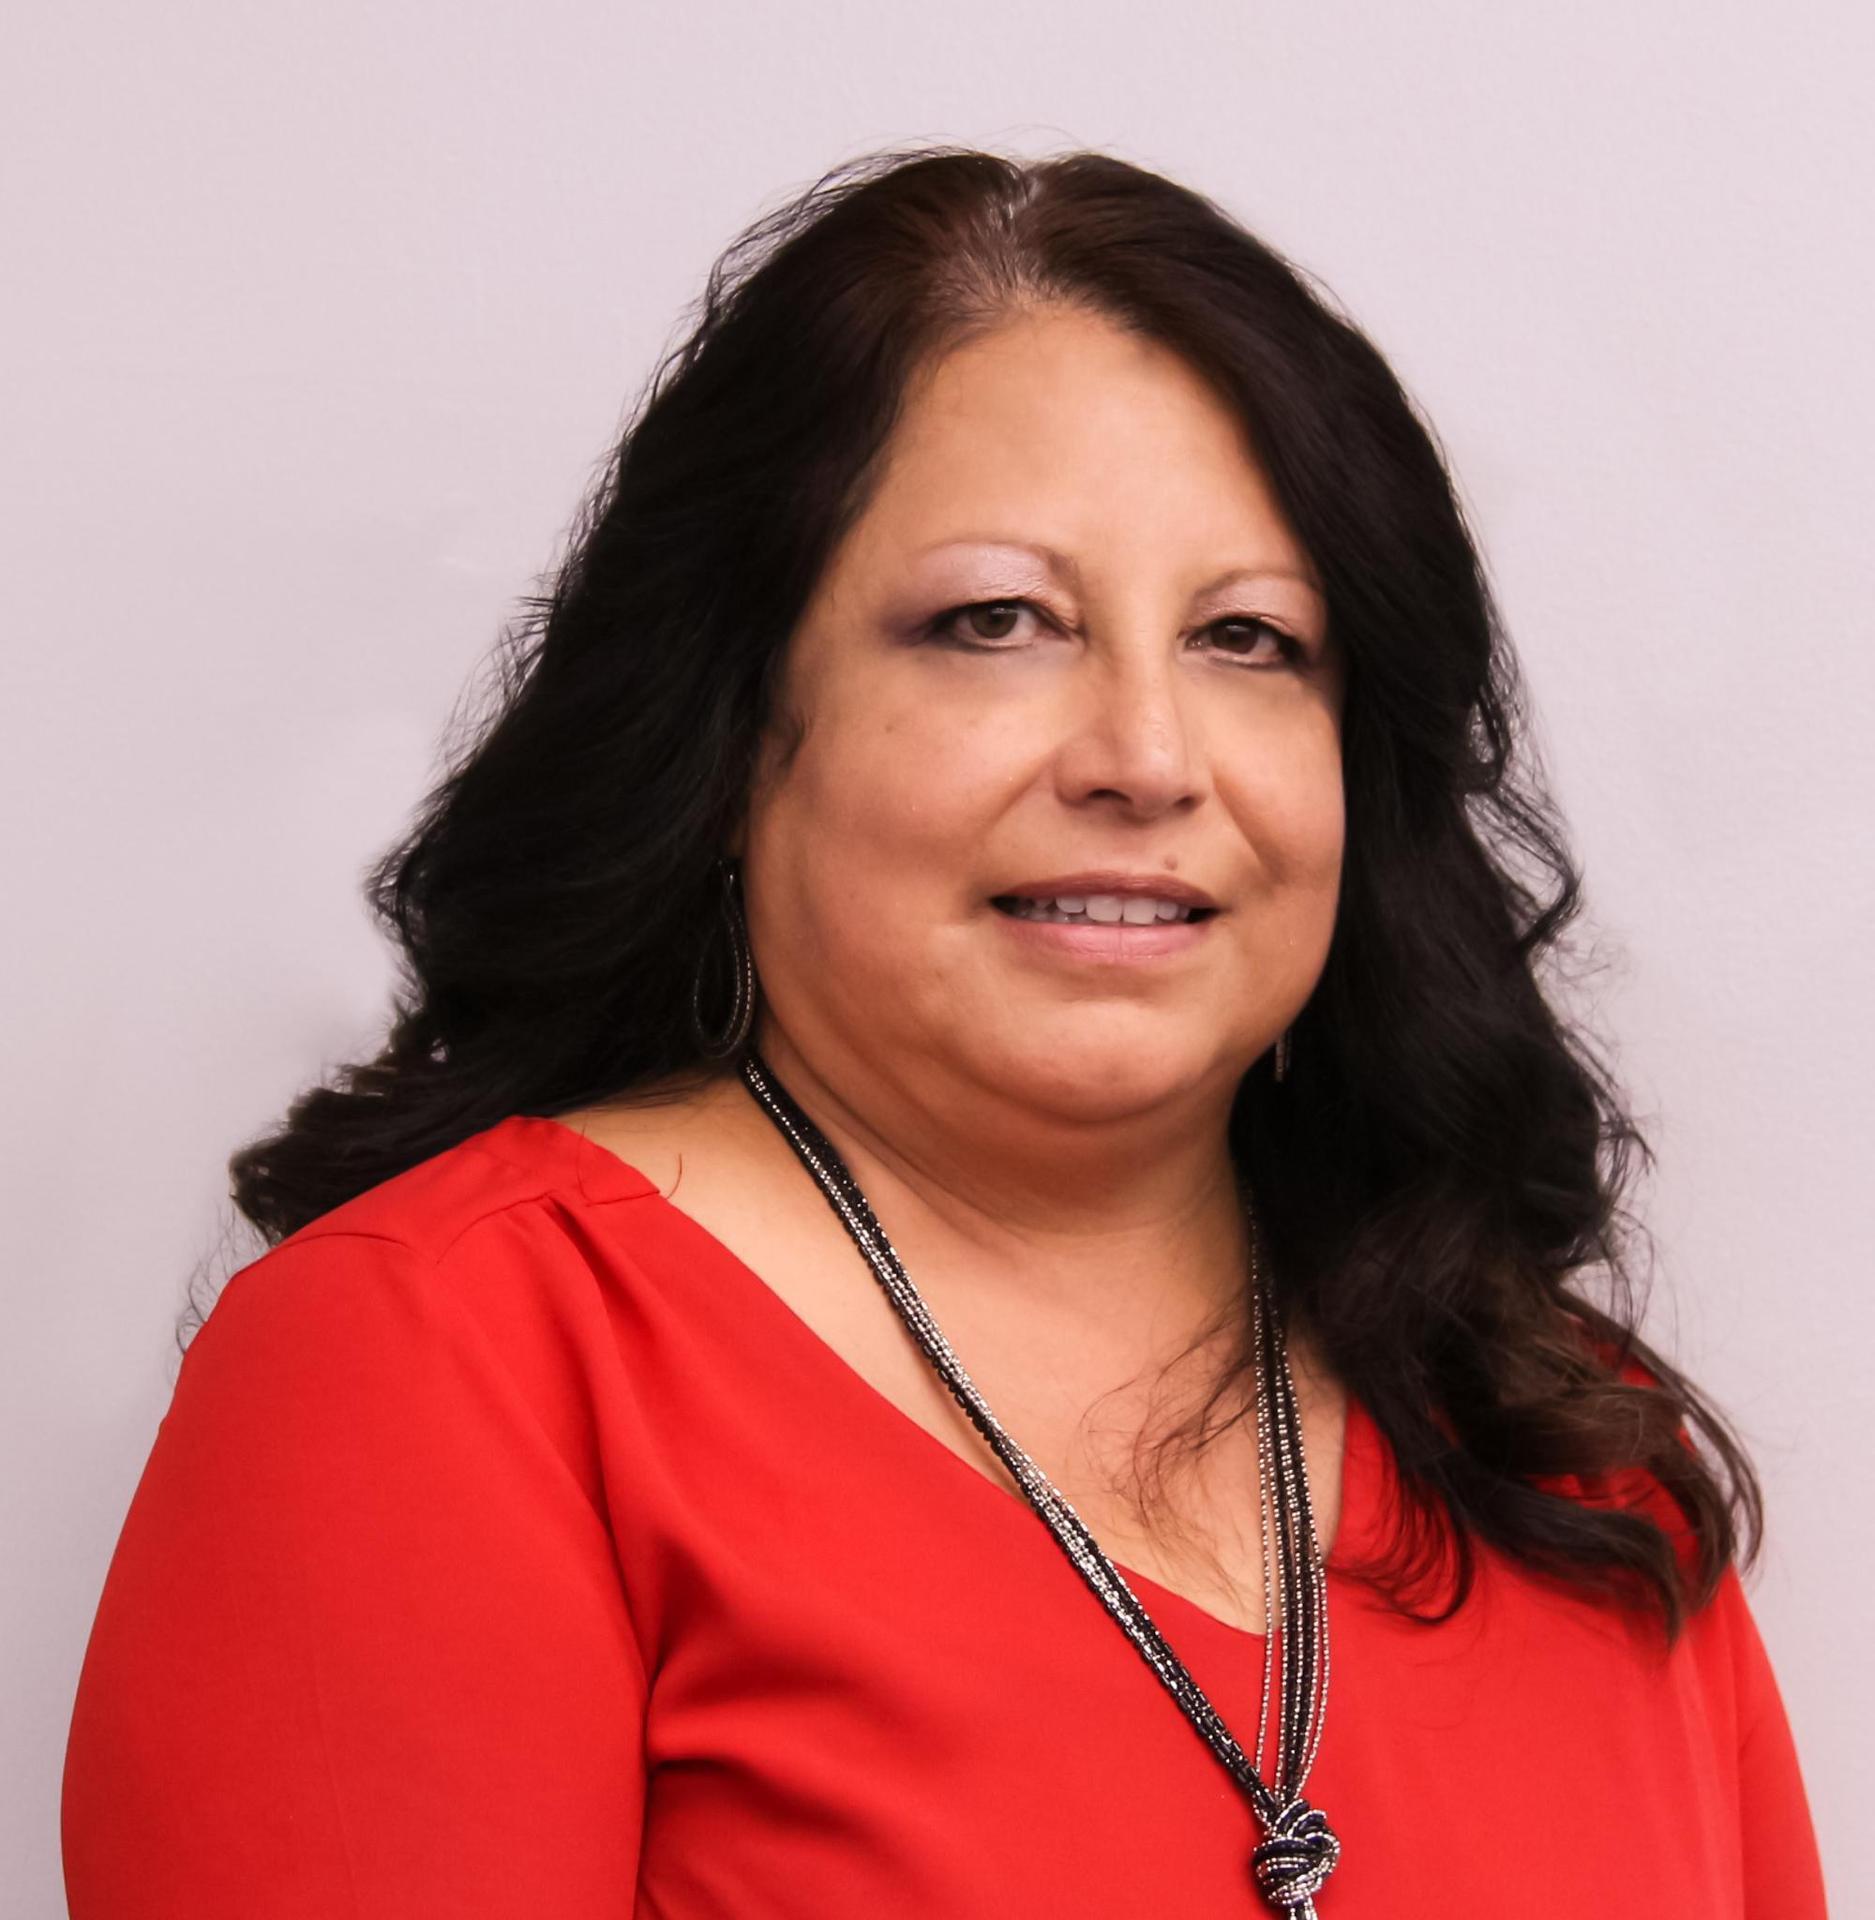 Elizabeth Zaragoza, Director of Preschool